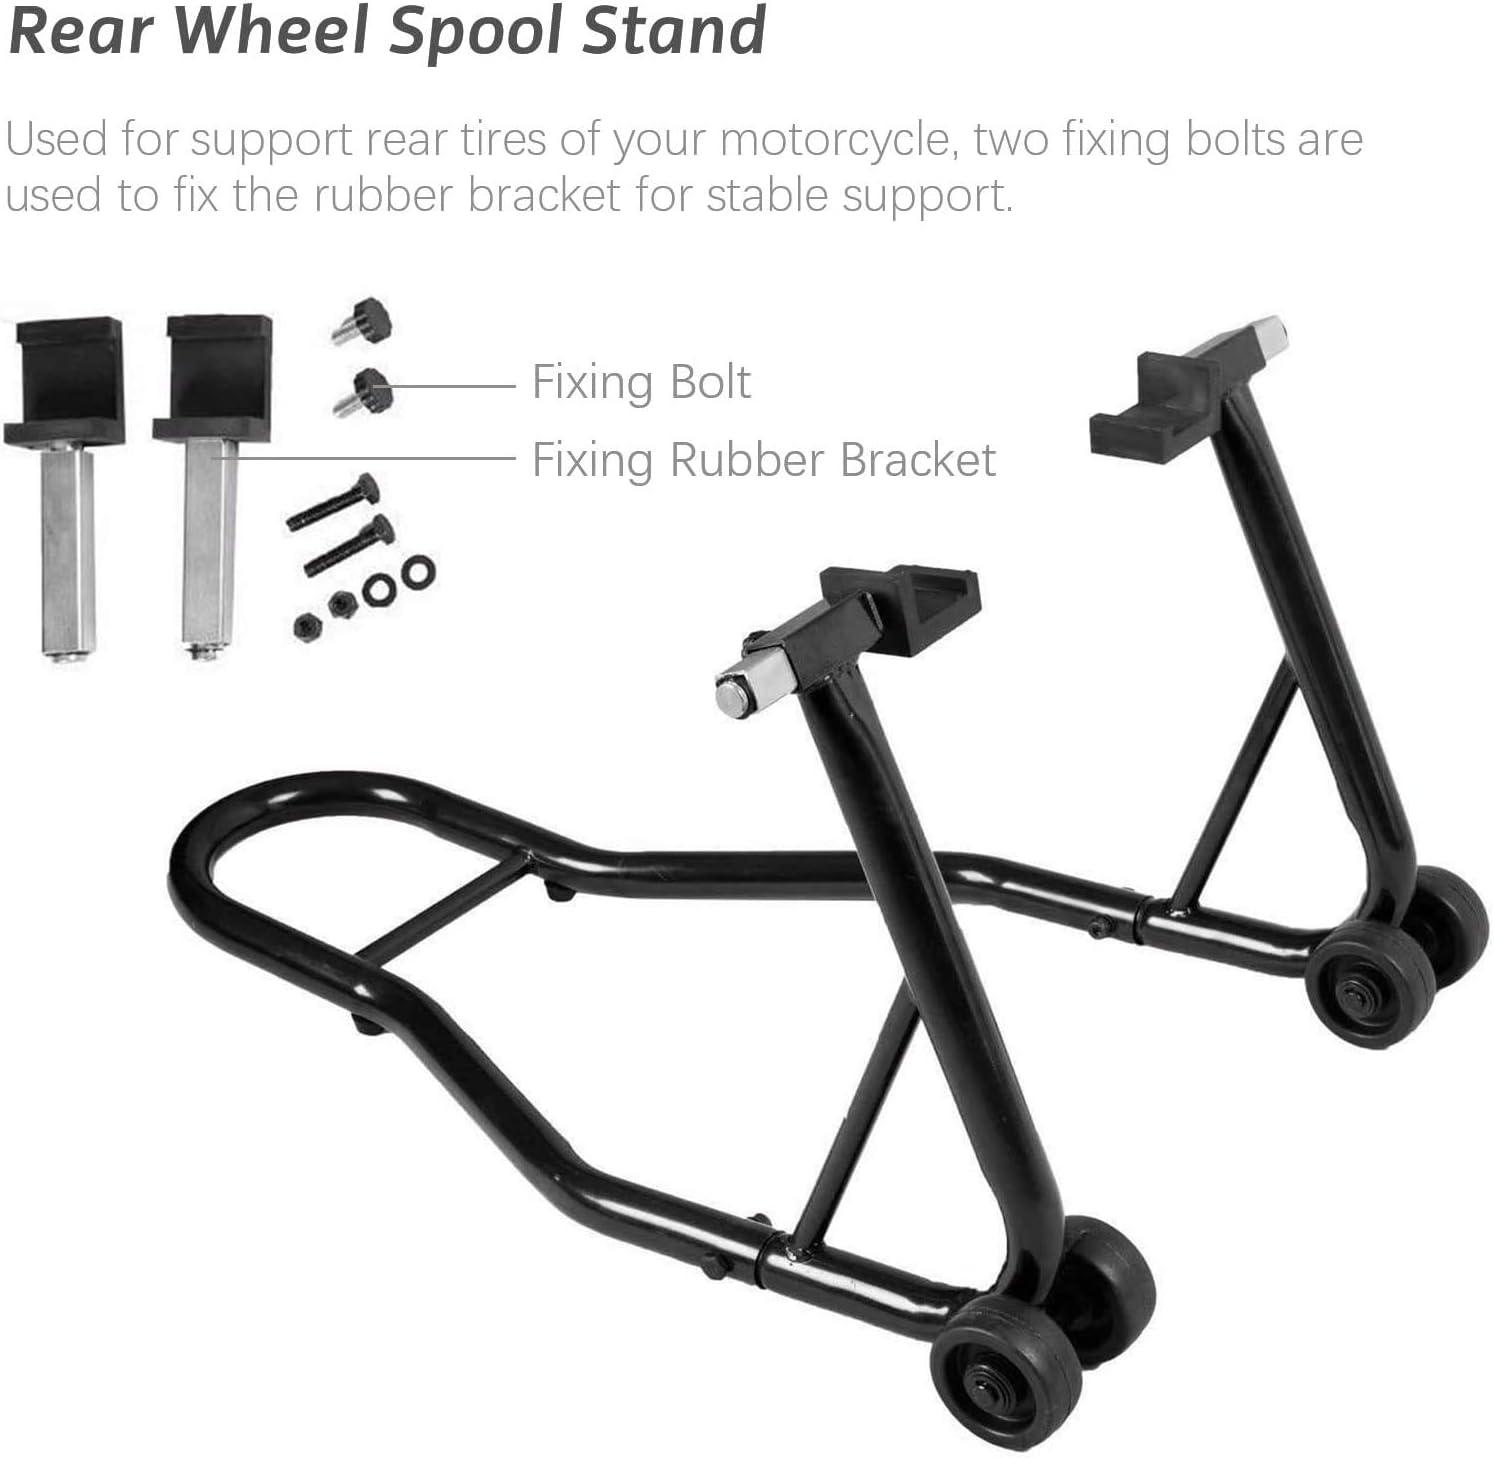 SUNROAD Motorcycle Bike Rear Wheel Swingarm Spool Lift Stand Paddock Stands,Black